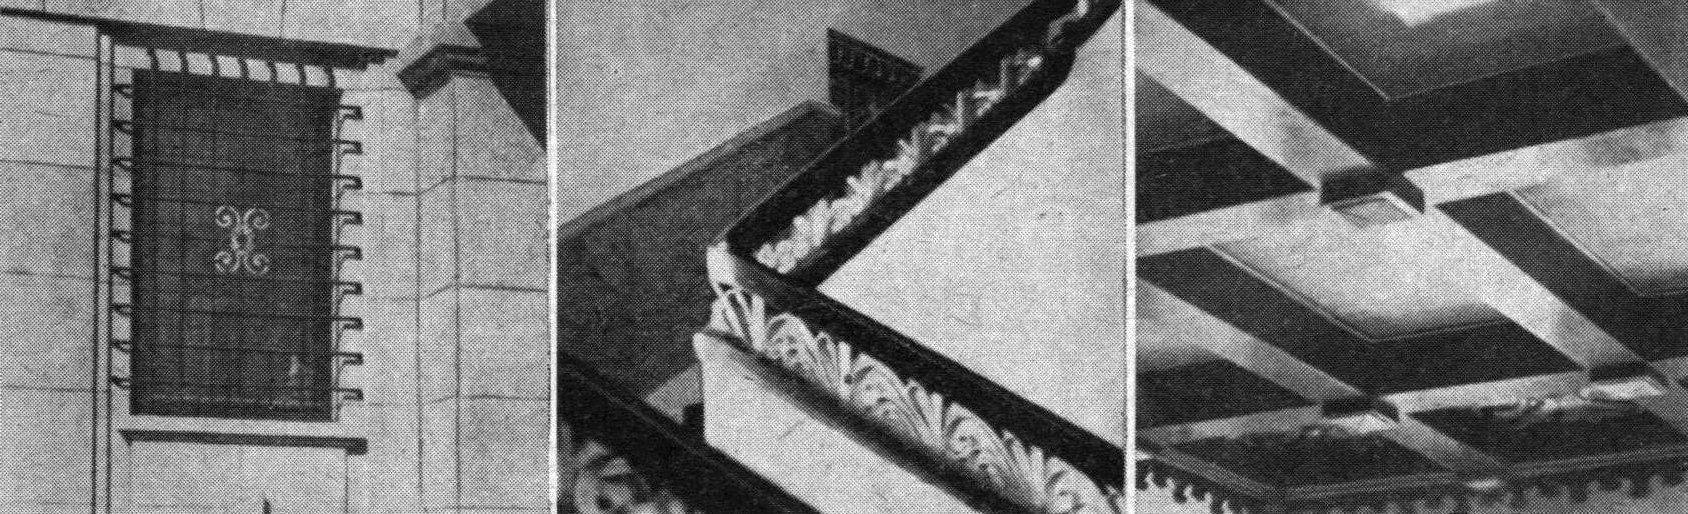 kardas 1937 nr 8 ramoves interjerai apkarpyta 3